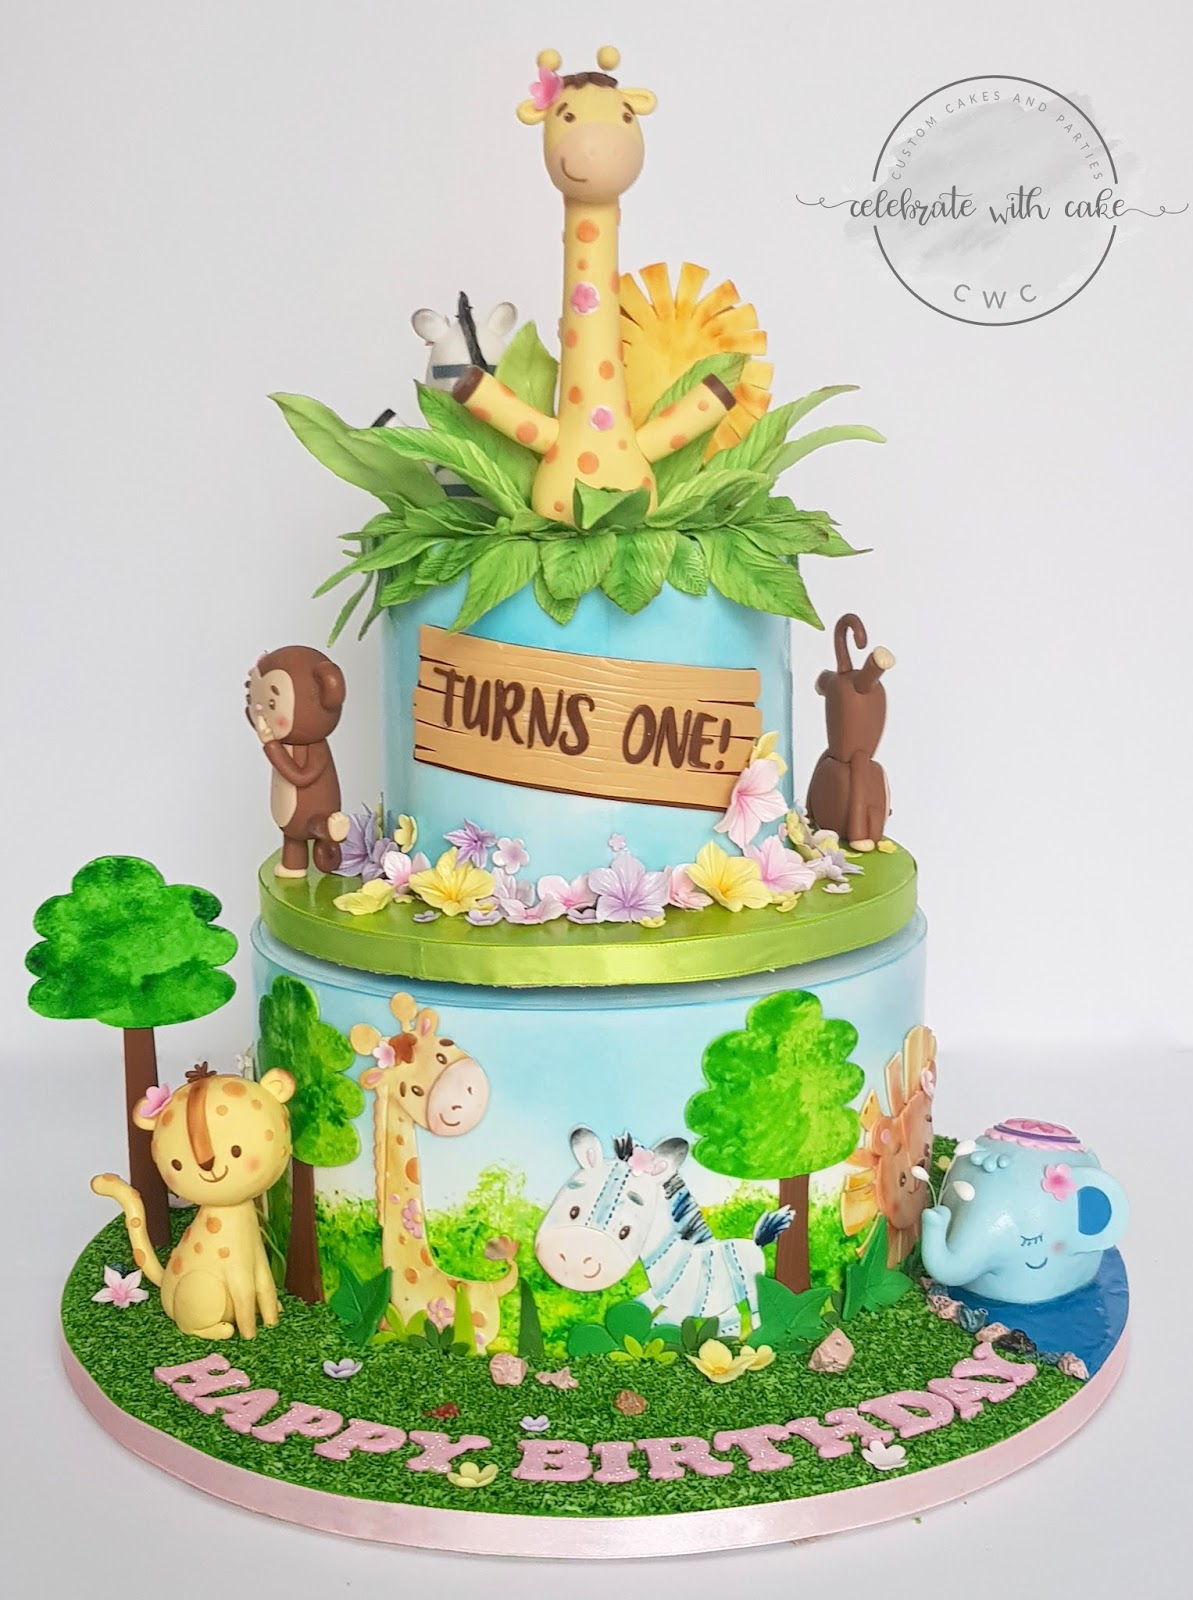 Celebrate With Cake Safari Animals Rotating 1st Birthday